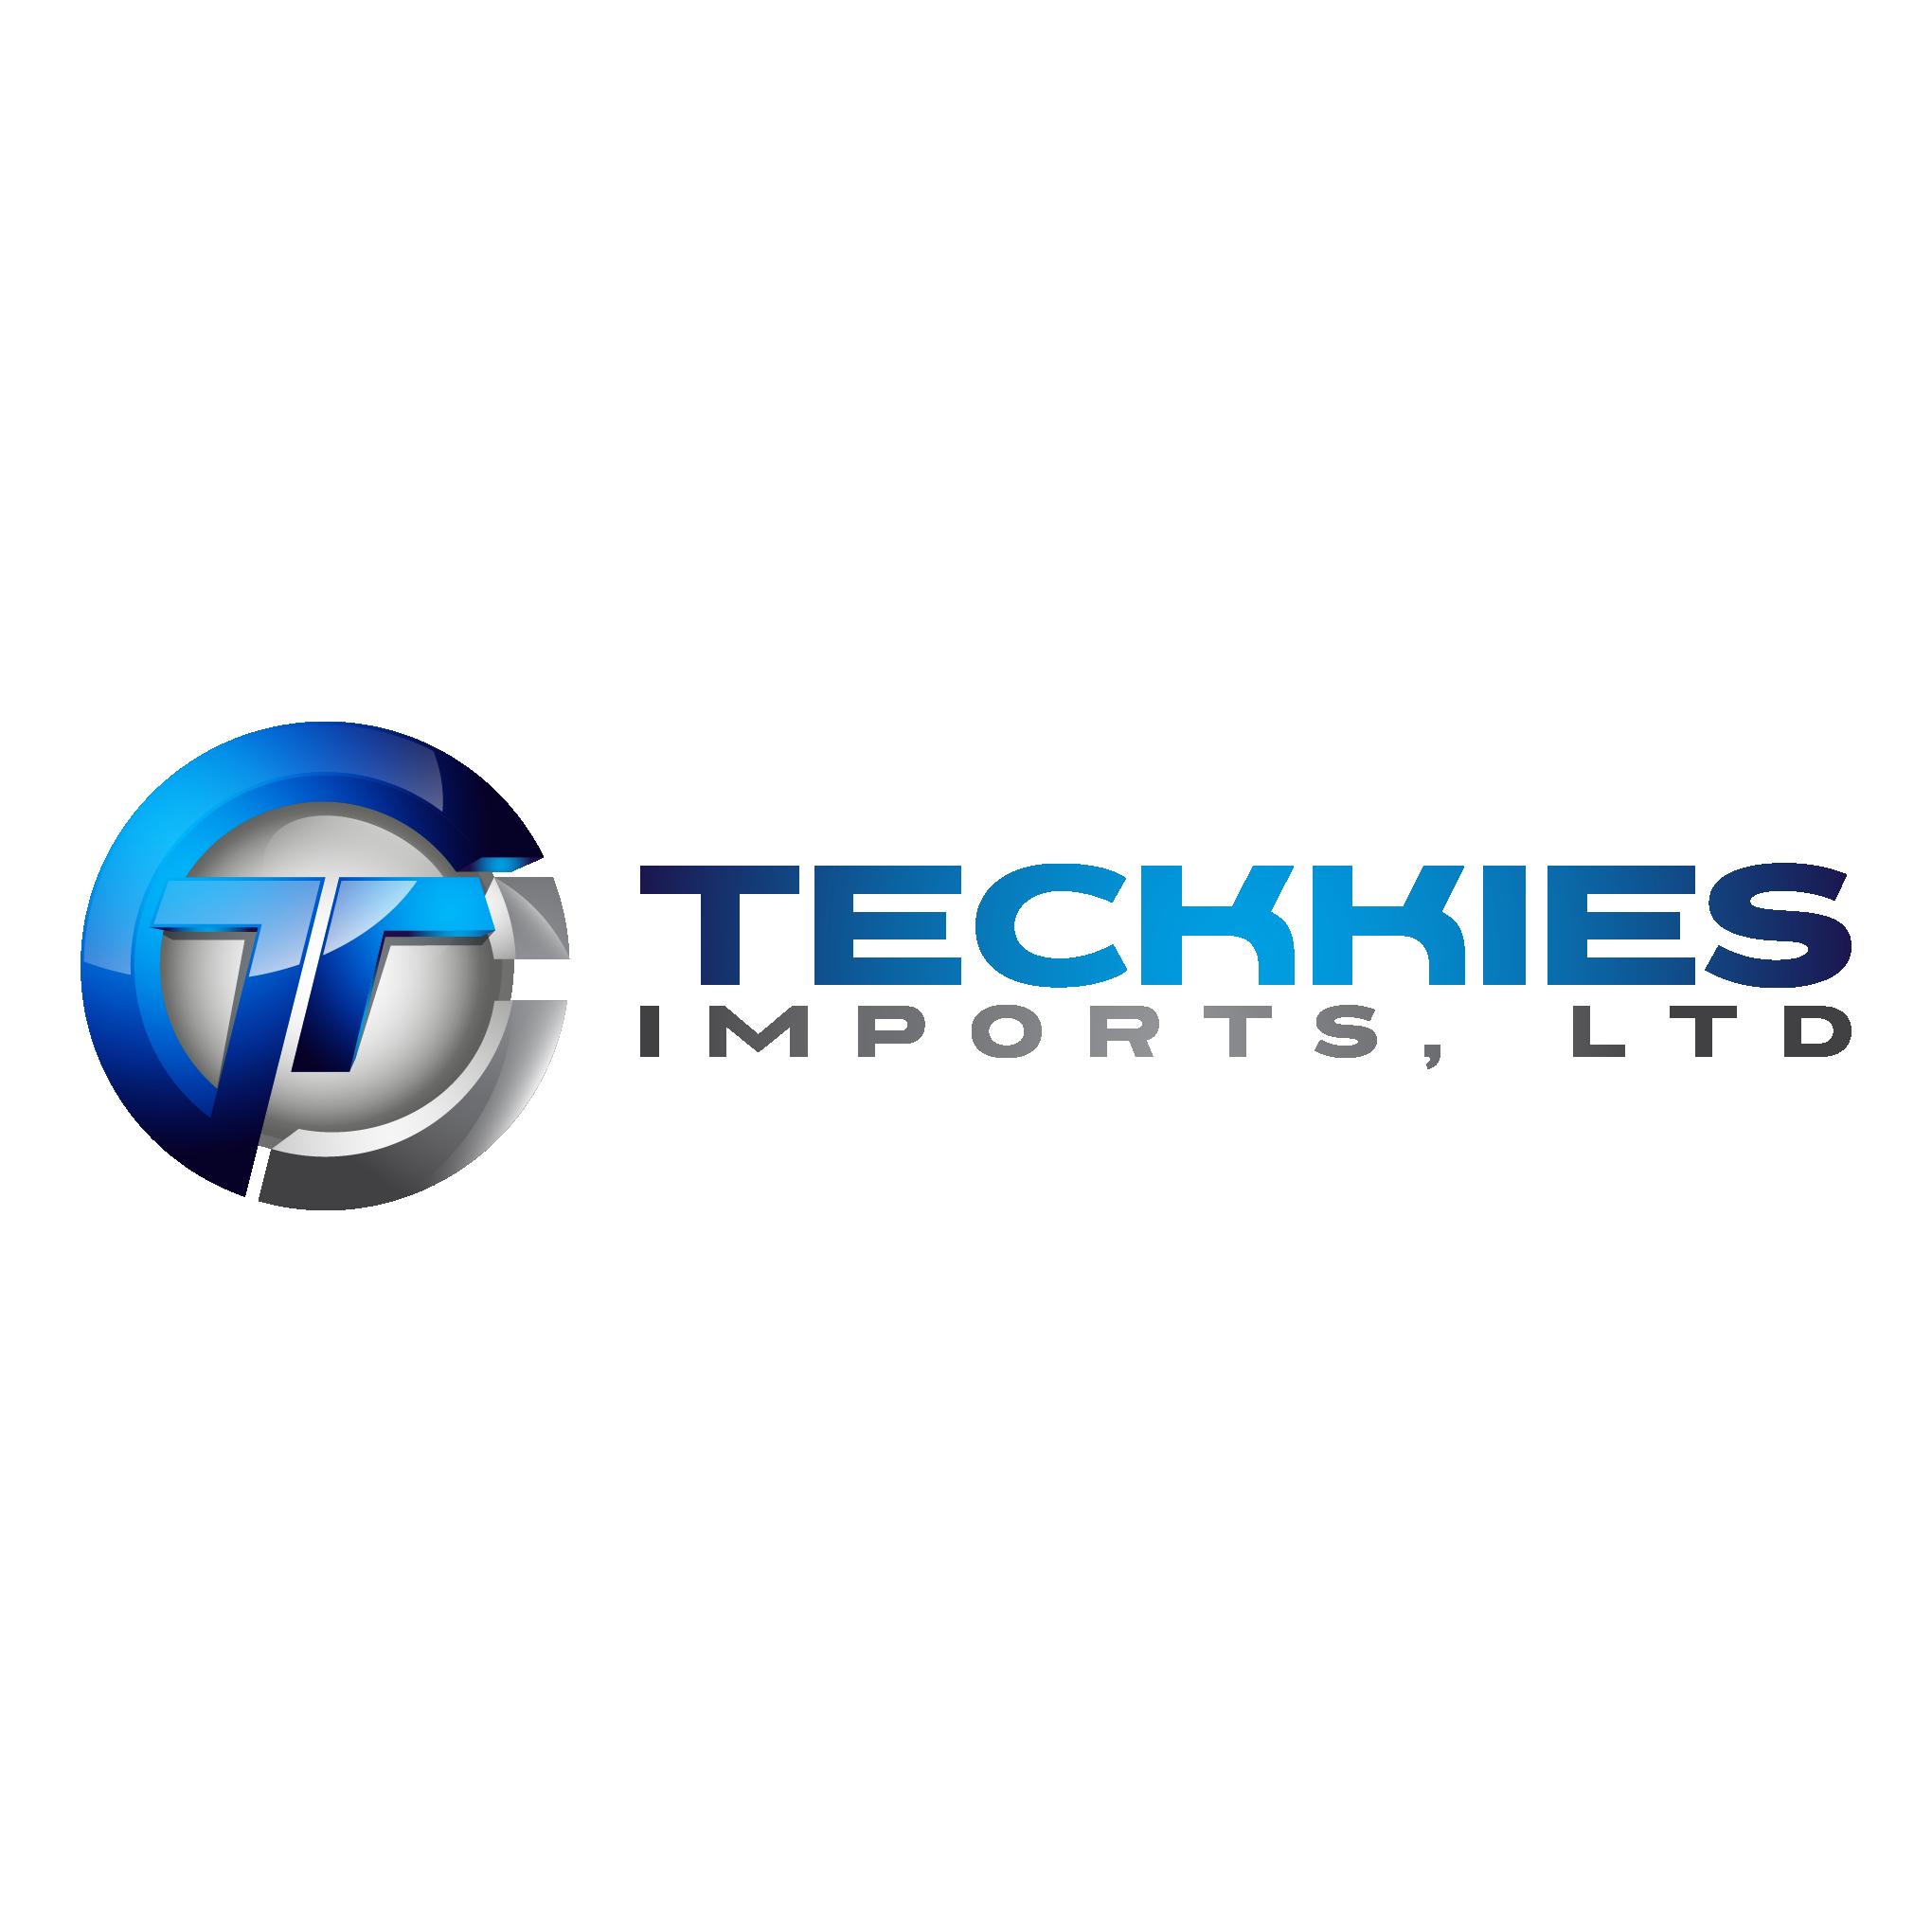 Teckkies Imports, Ltd